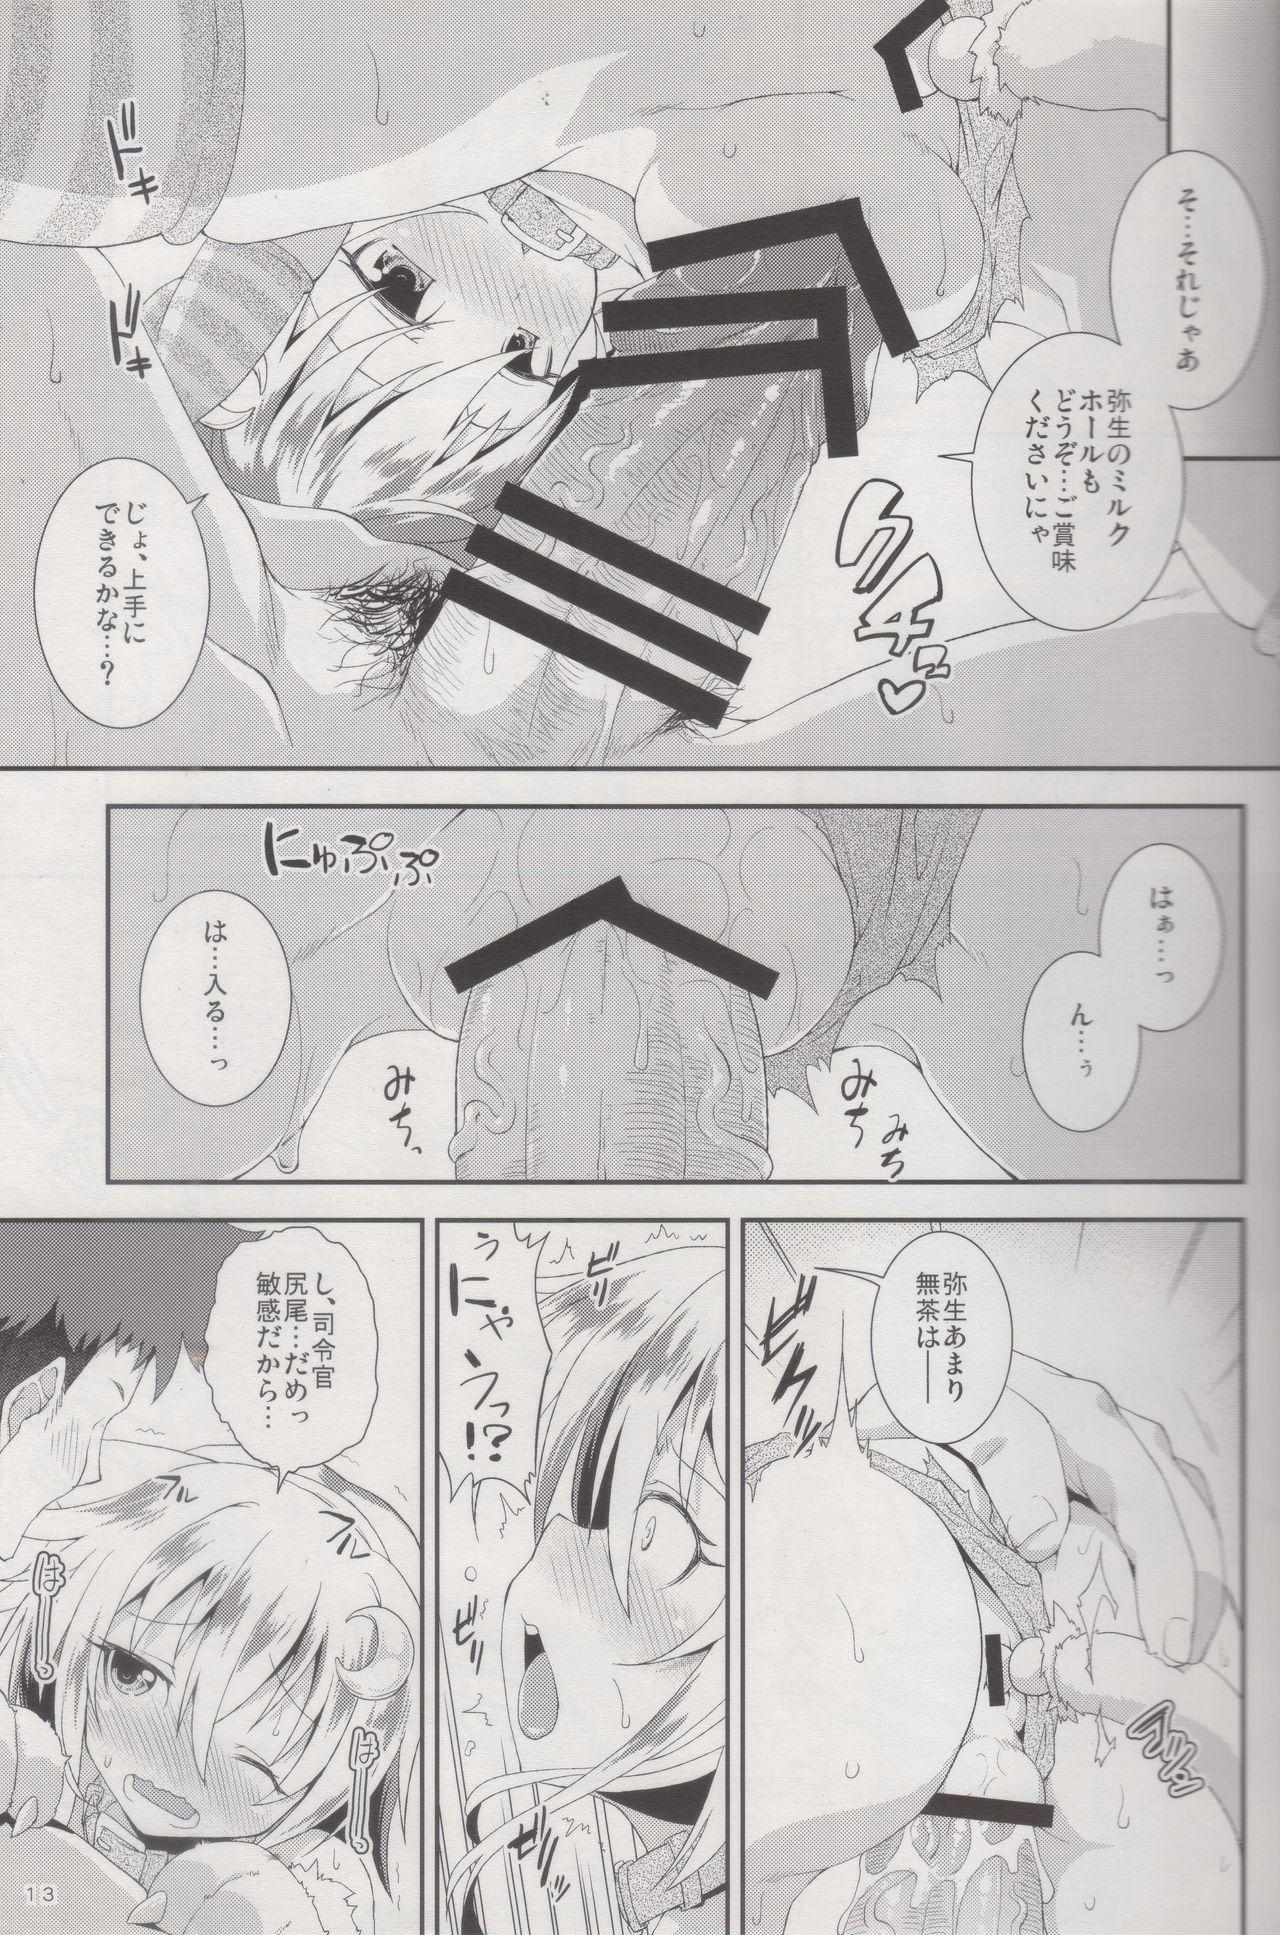 (C90) [Igou (Yamazaki Kana)] Let's U-! Ya-! (Kantai Collection -KanColle-) 11